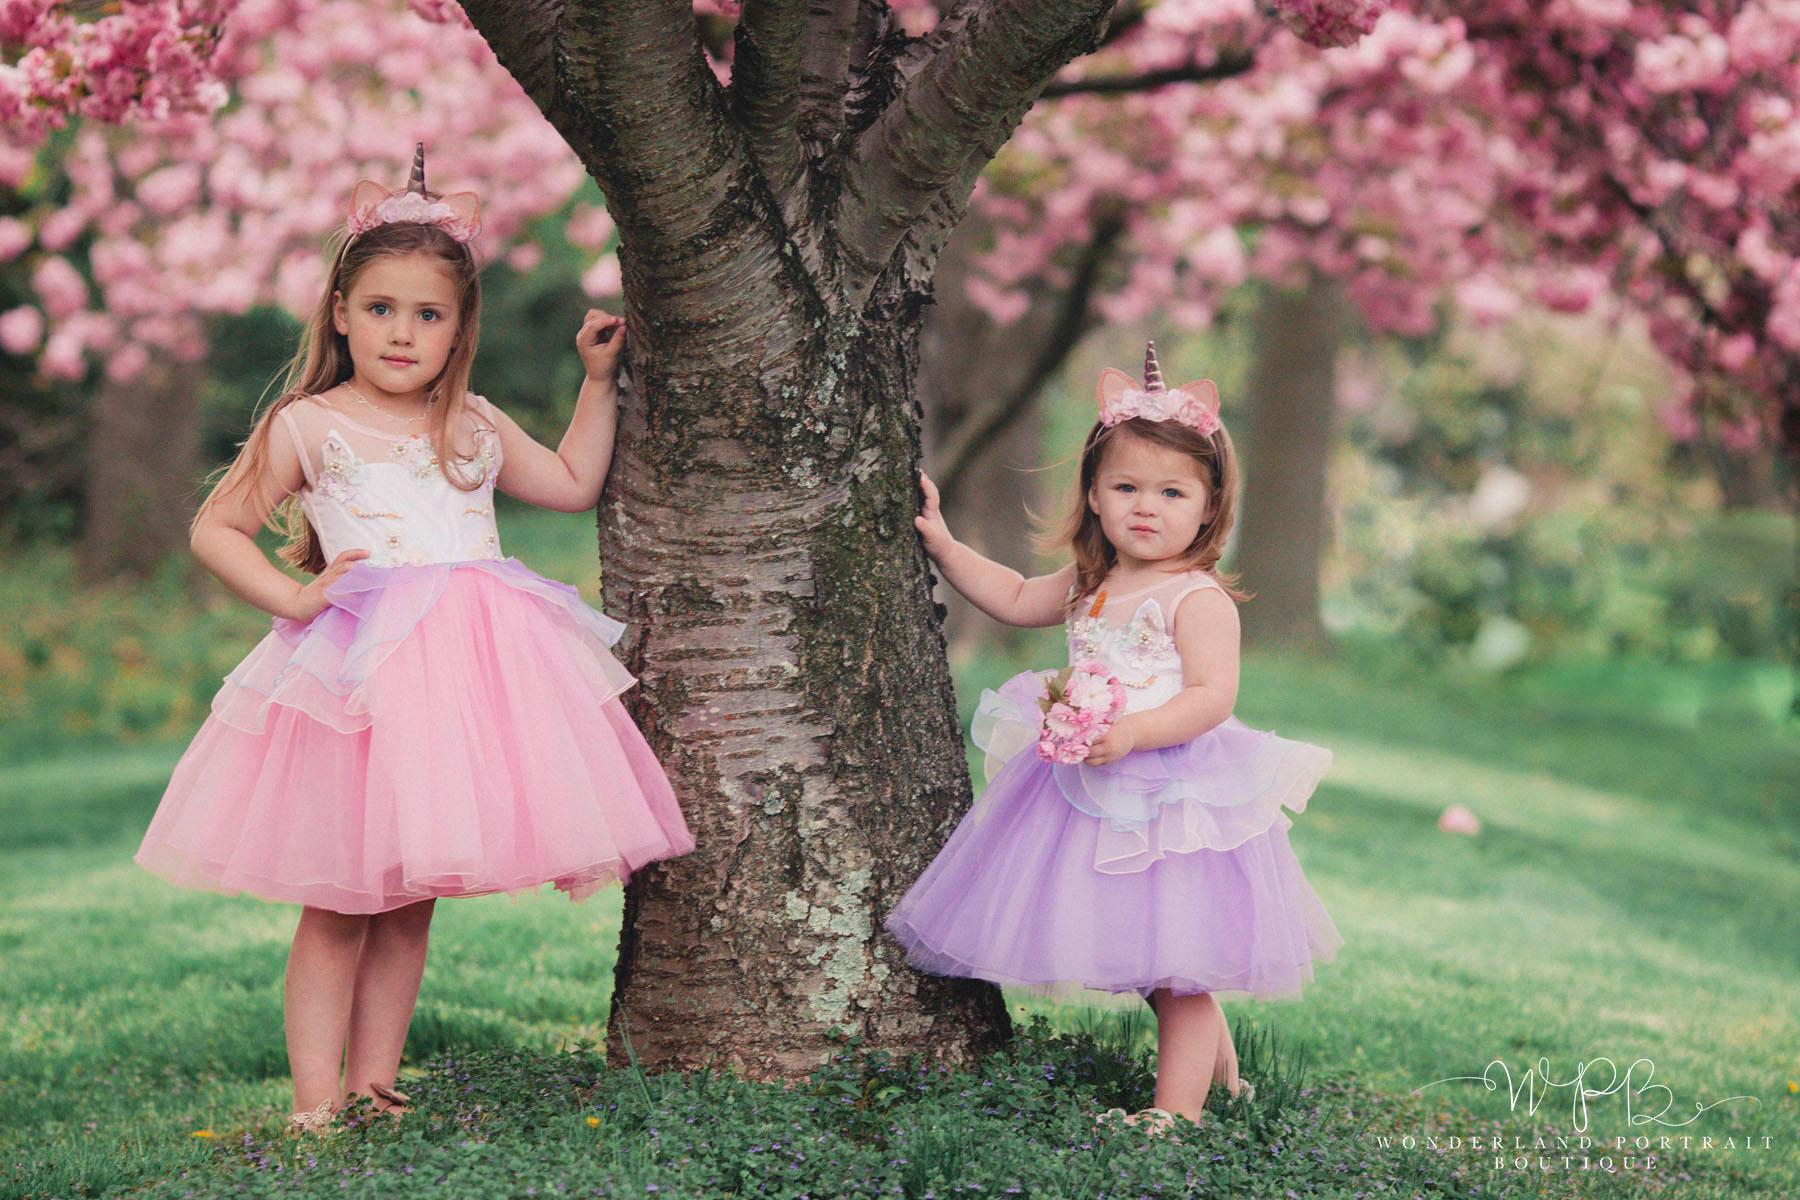 Bucks-County-Child-Photographer